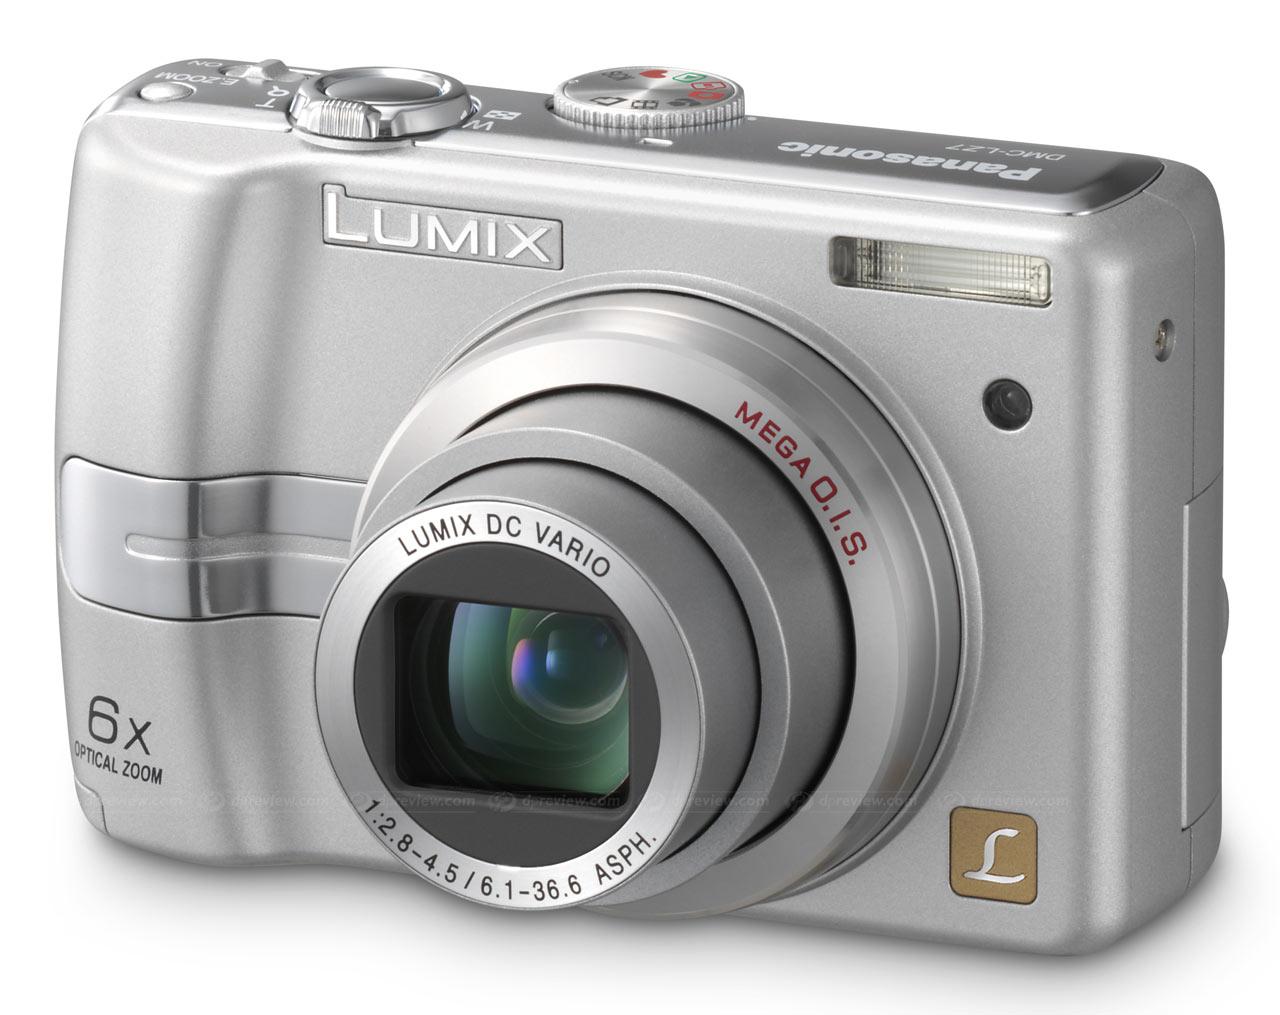 panasonic lumix dmc lz6 dmc lz7 digital photography review rh dpreview com Panasonic Lumix DMC FZ30 Software Panasonic Lumix GH3